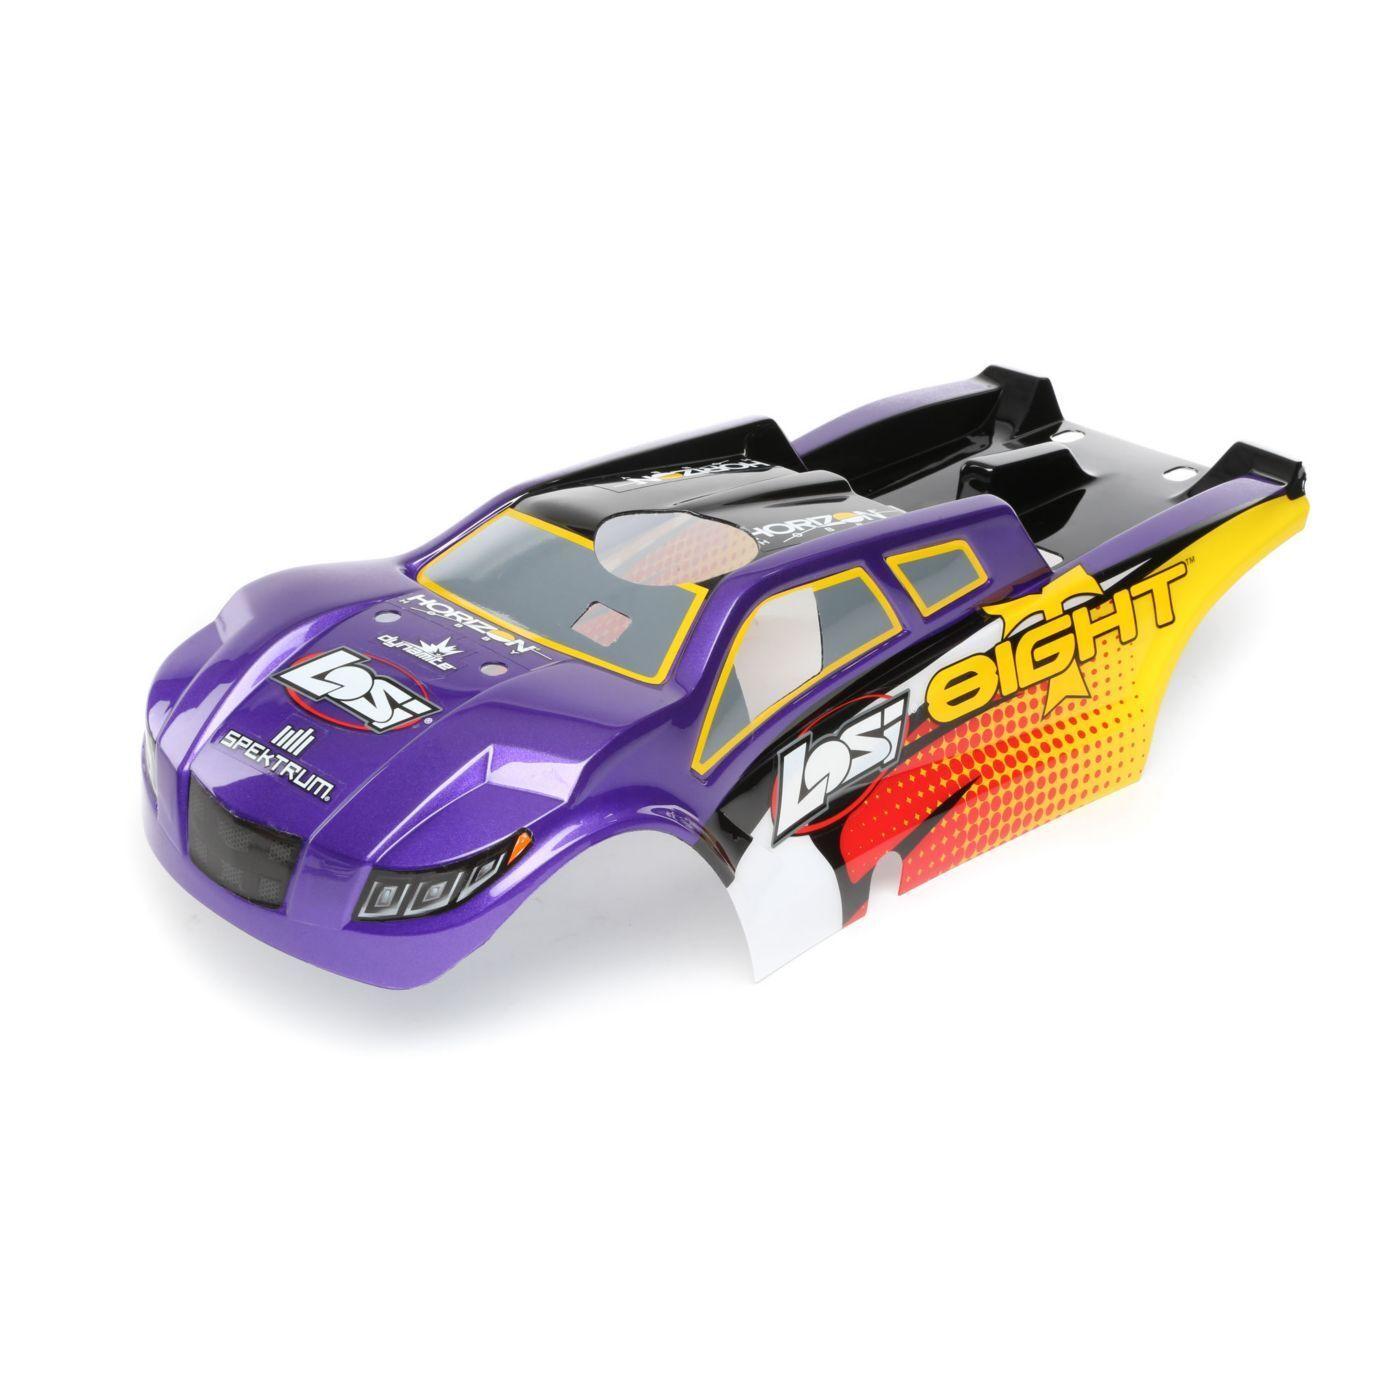 Losi Racing LOS240008 Body Painted Nitro 8IGHT-T RTR